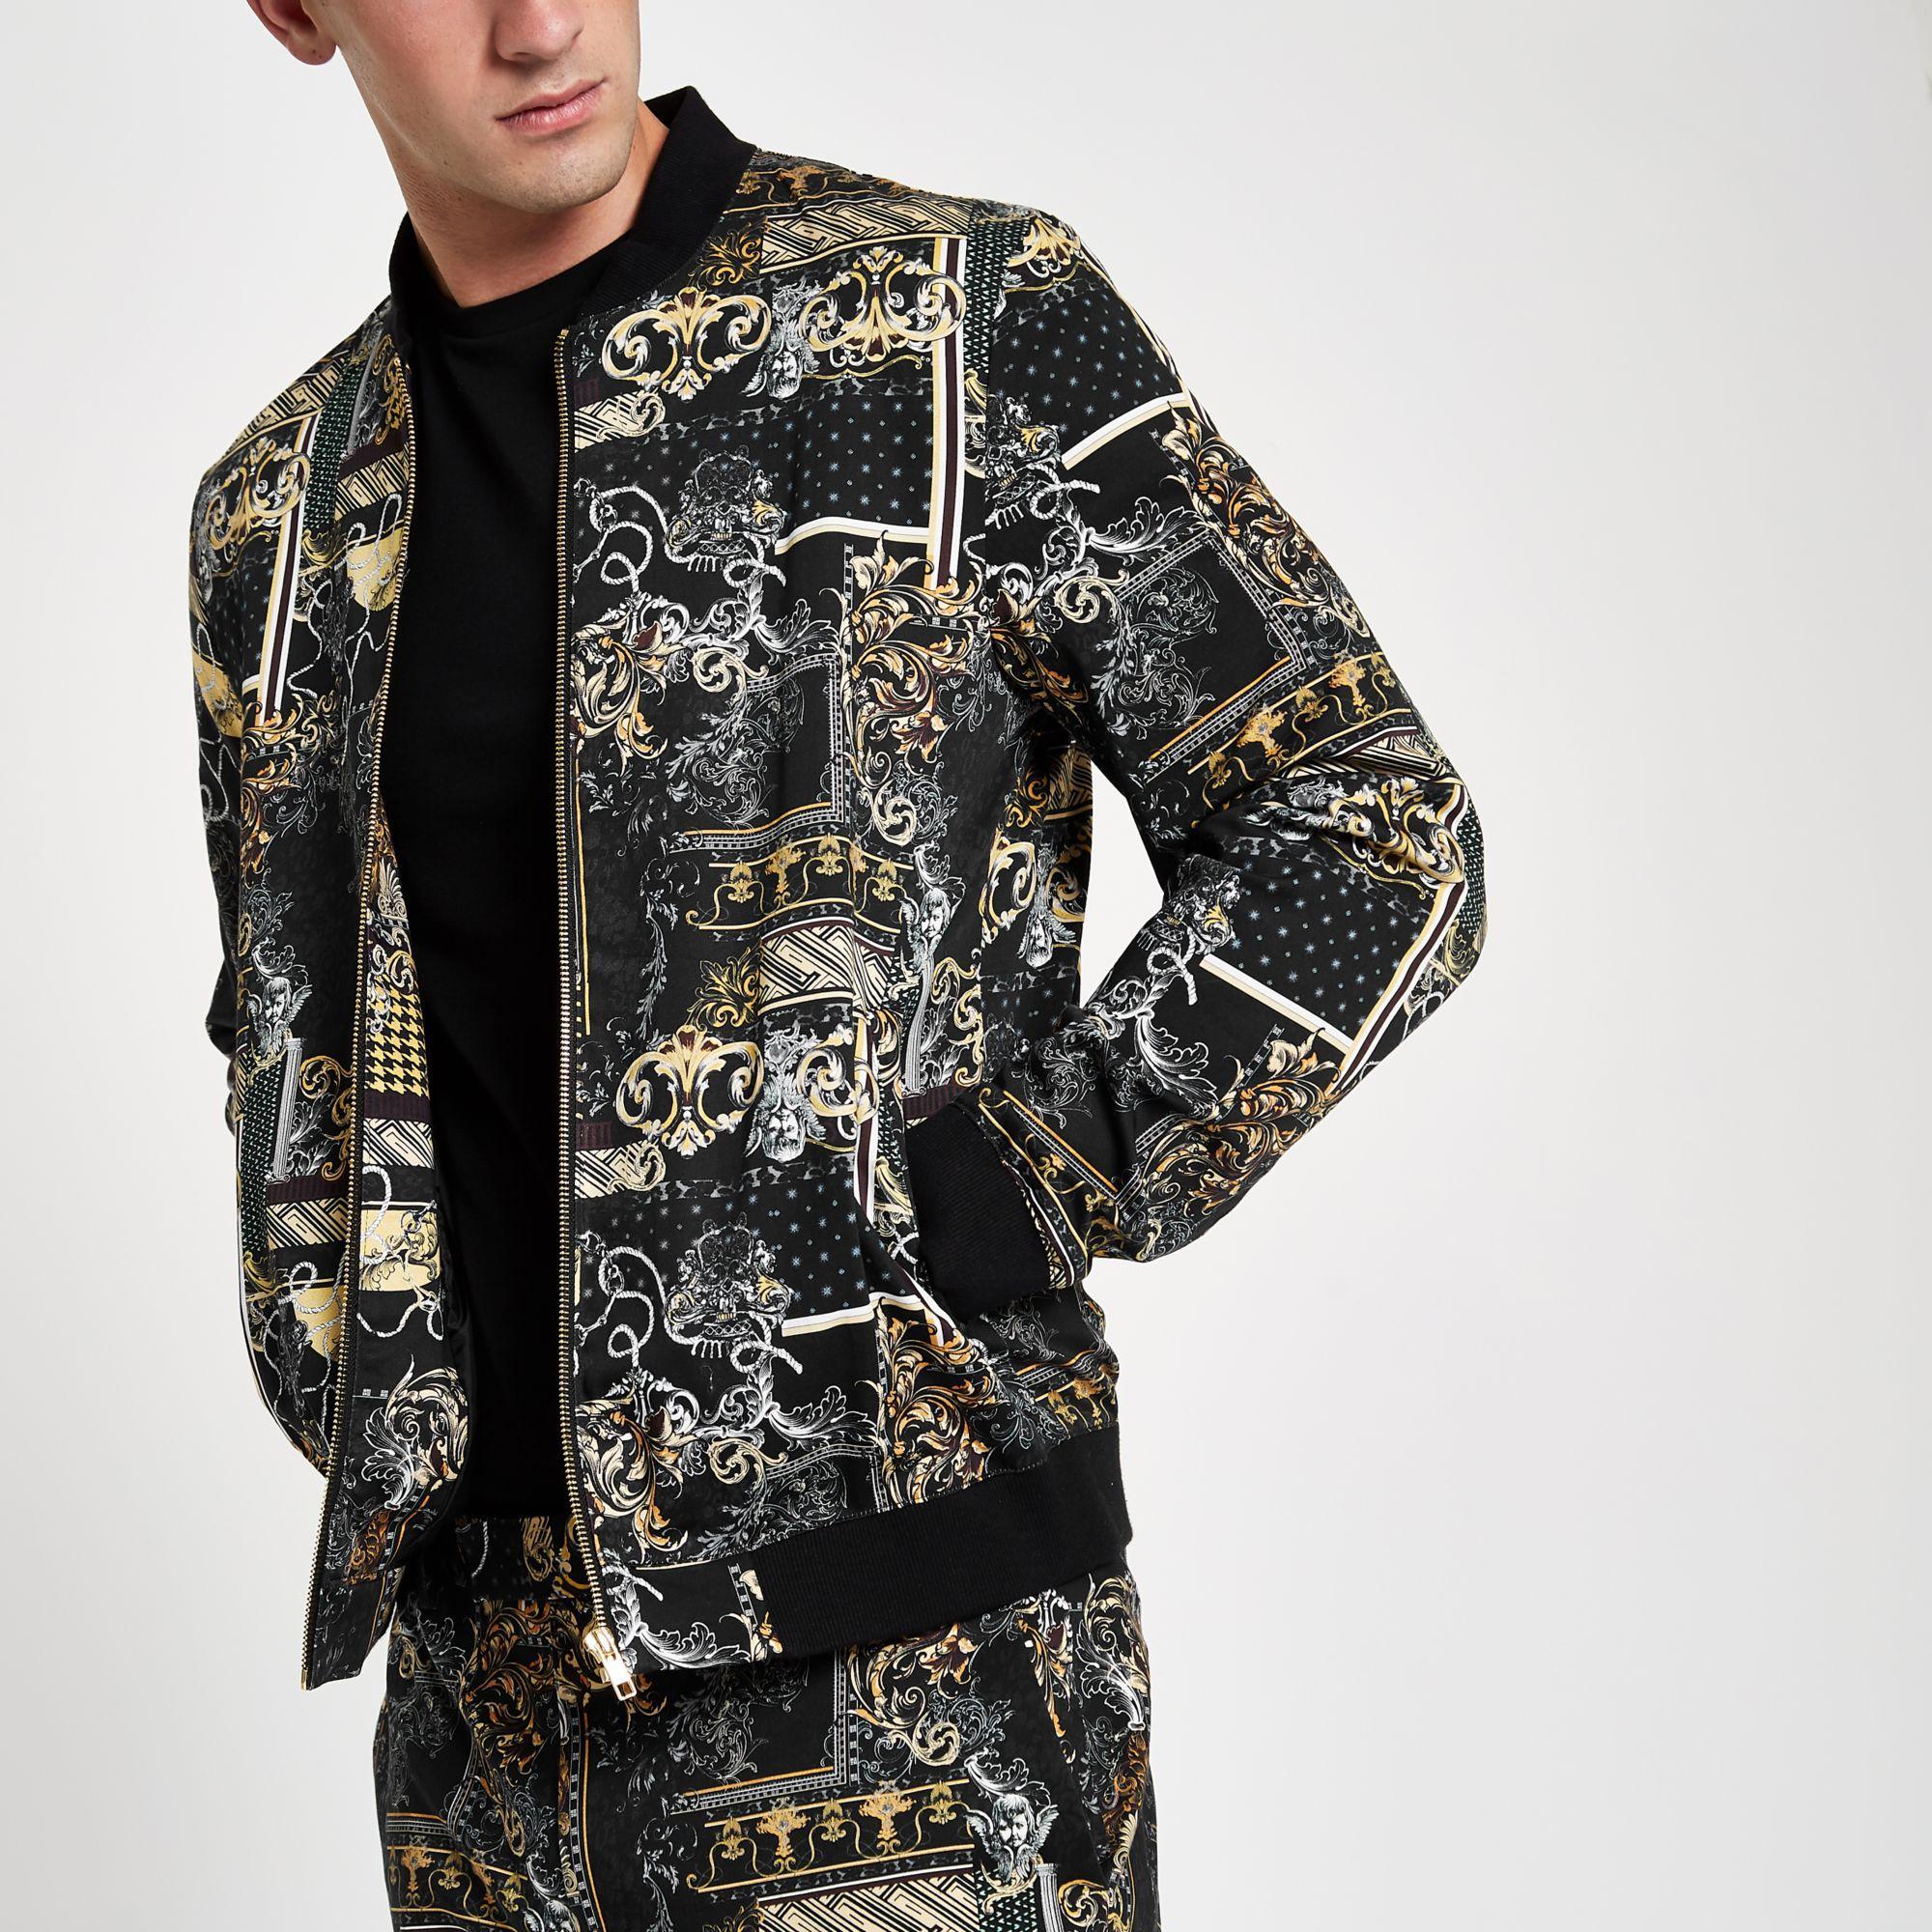 220005186 River Island Black Baroque Print Bomber Jacket for Men - Lyst